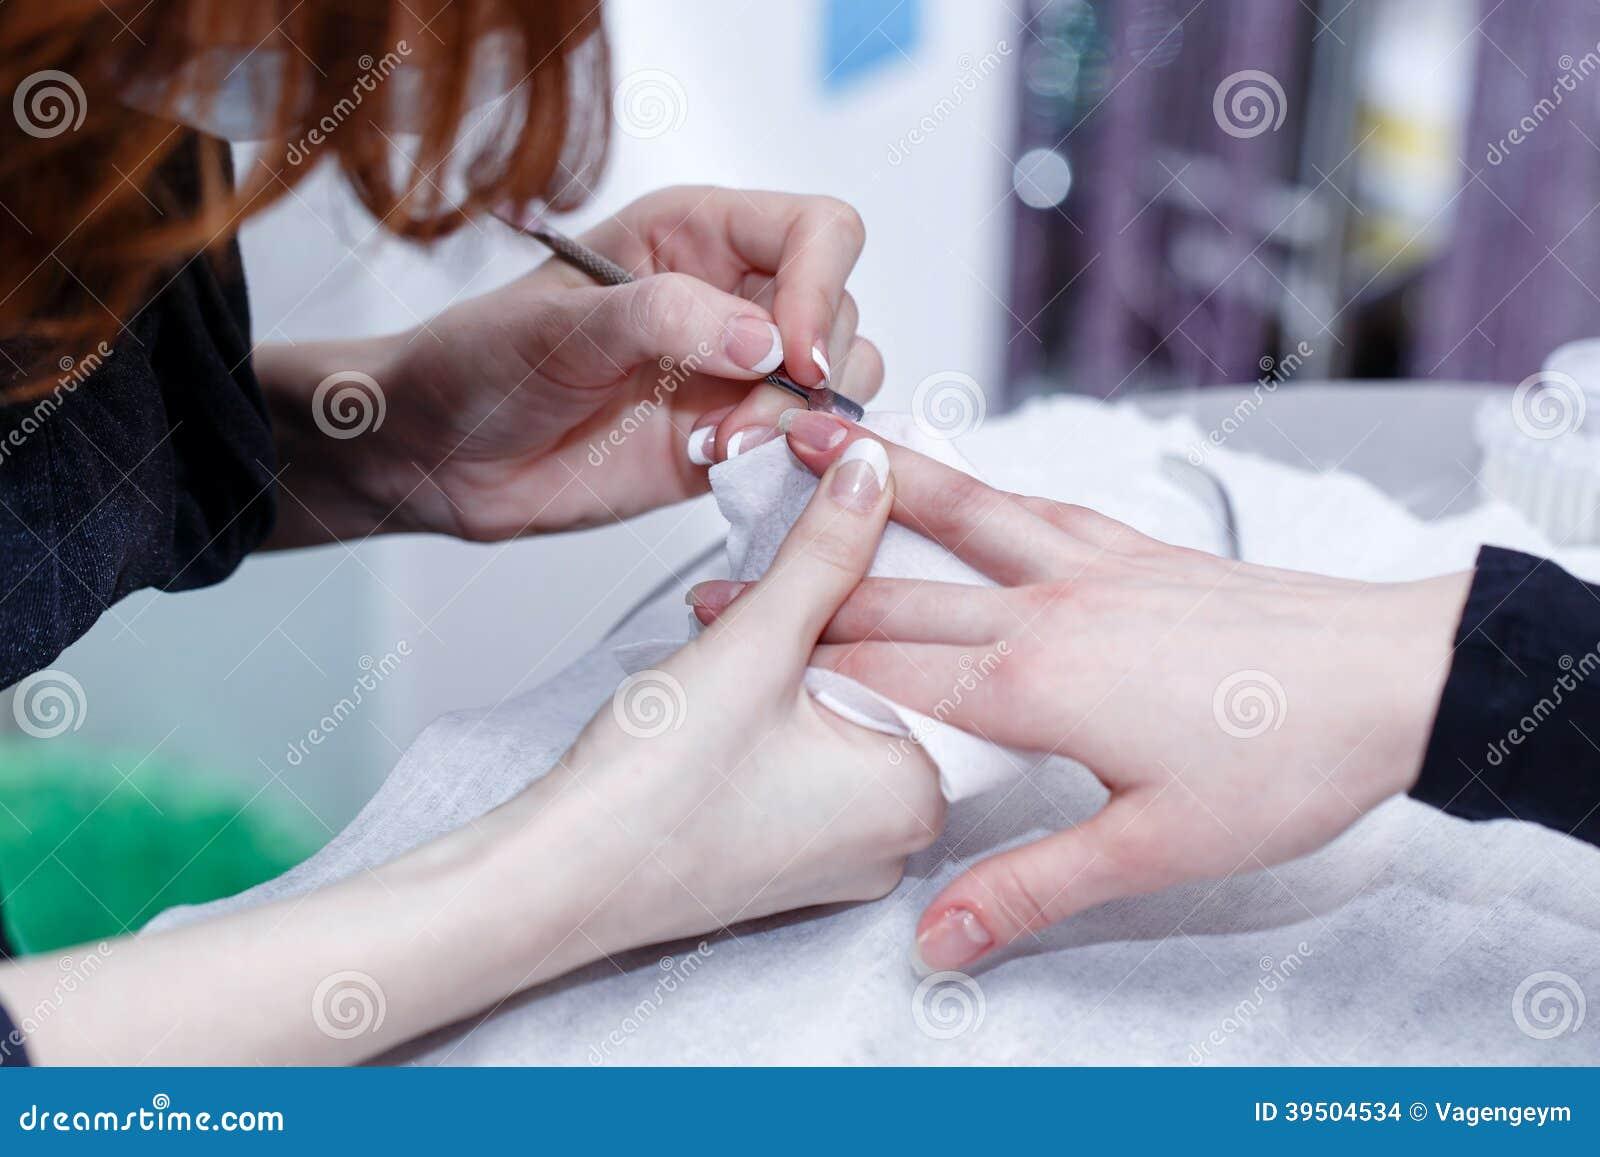 Creation manicure